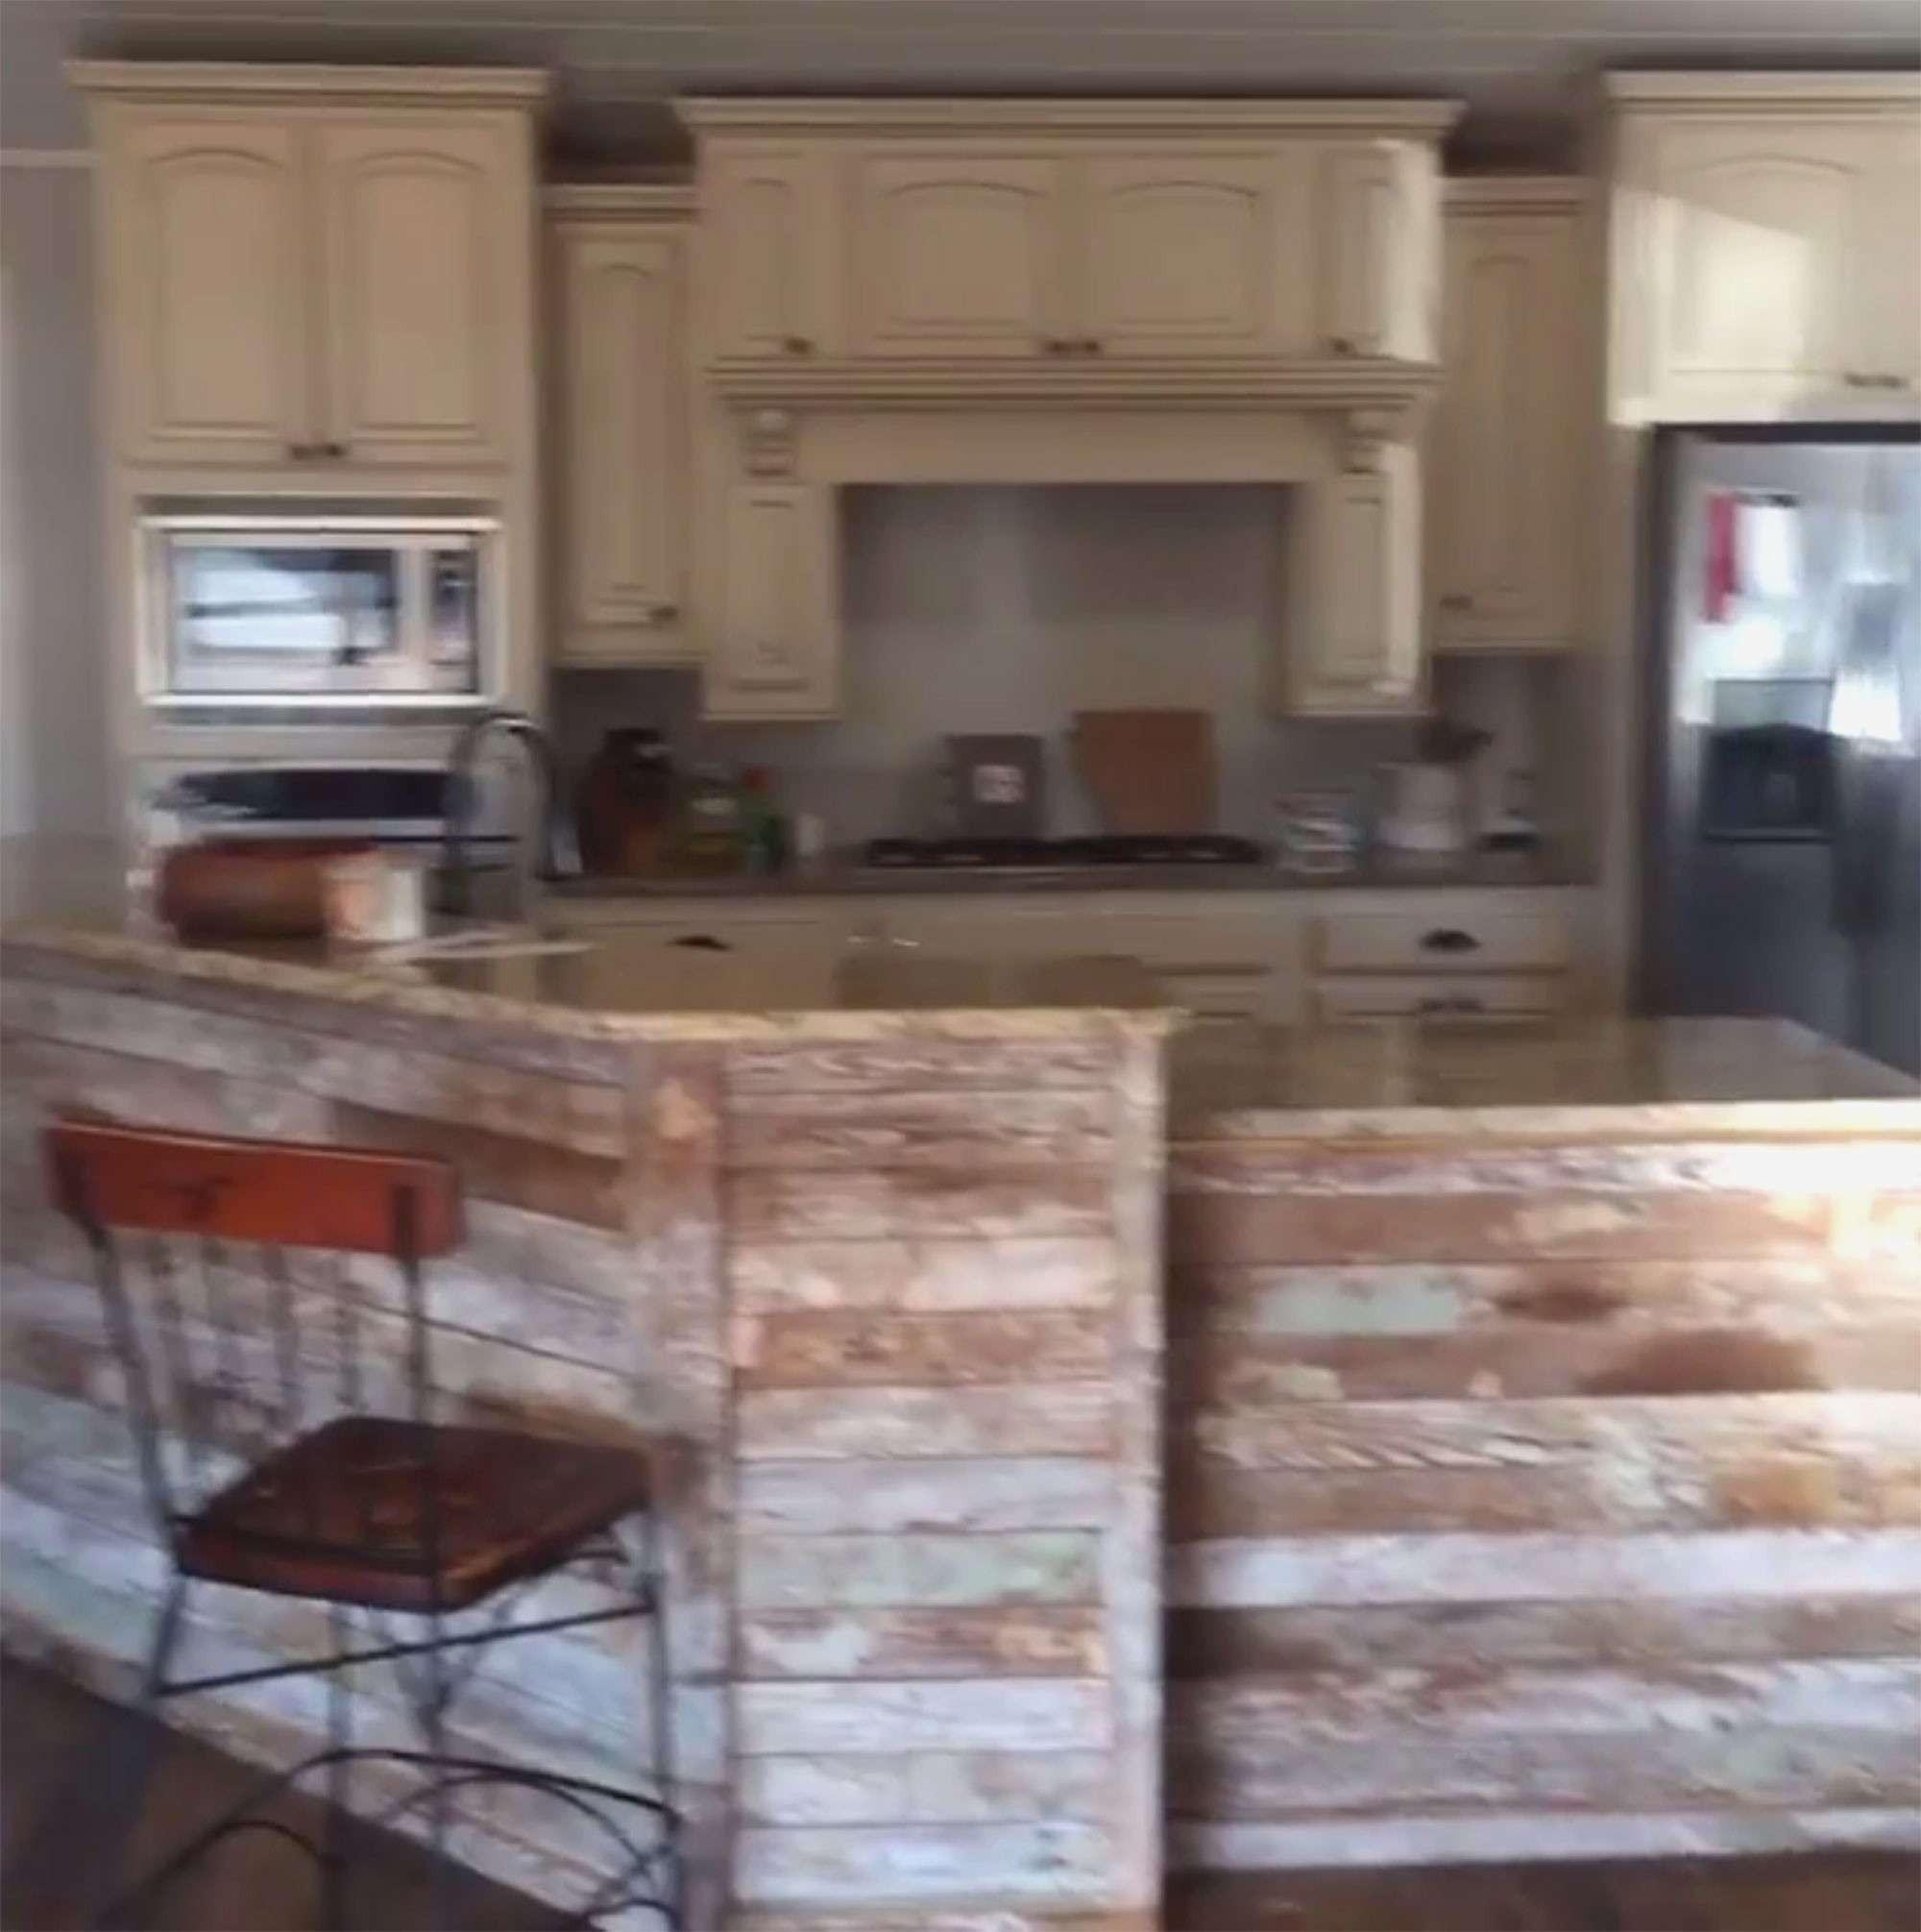 hardwood floor on carpet of most durable kitchen flooring new kitchens new kitchen kitchens with regard to most durable kitchen flooring new kitchens new kitchen kitchens unlimited kitchens unlimited 0d